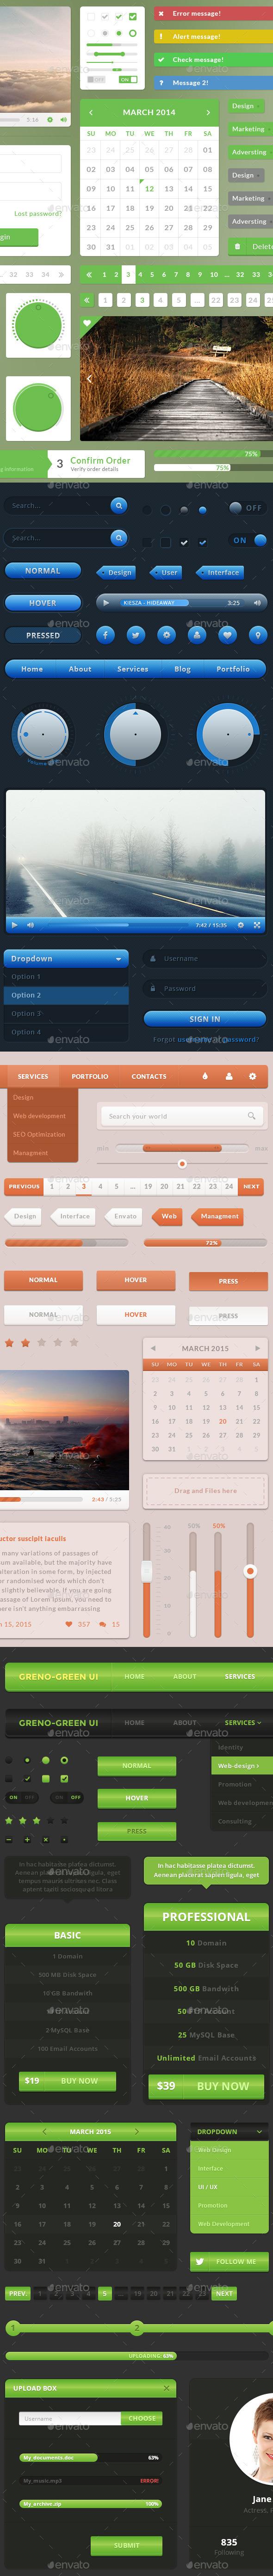 GraphicRiver UI Web Elements Pack 2 10672788